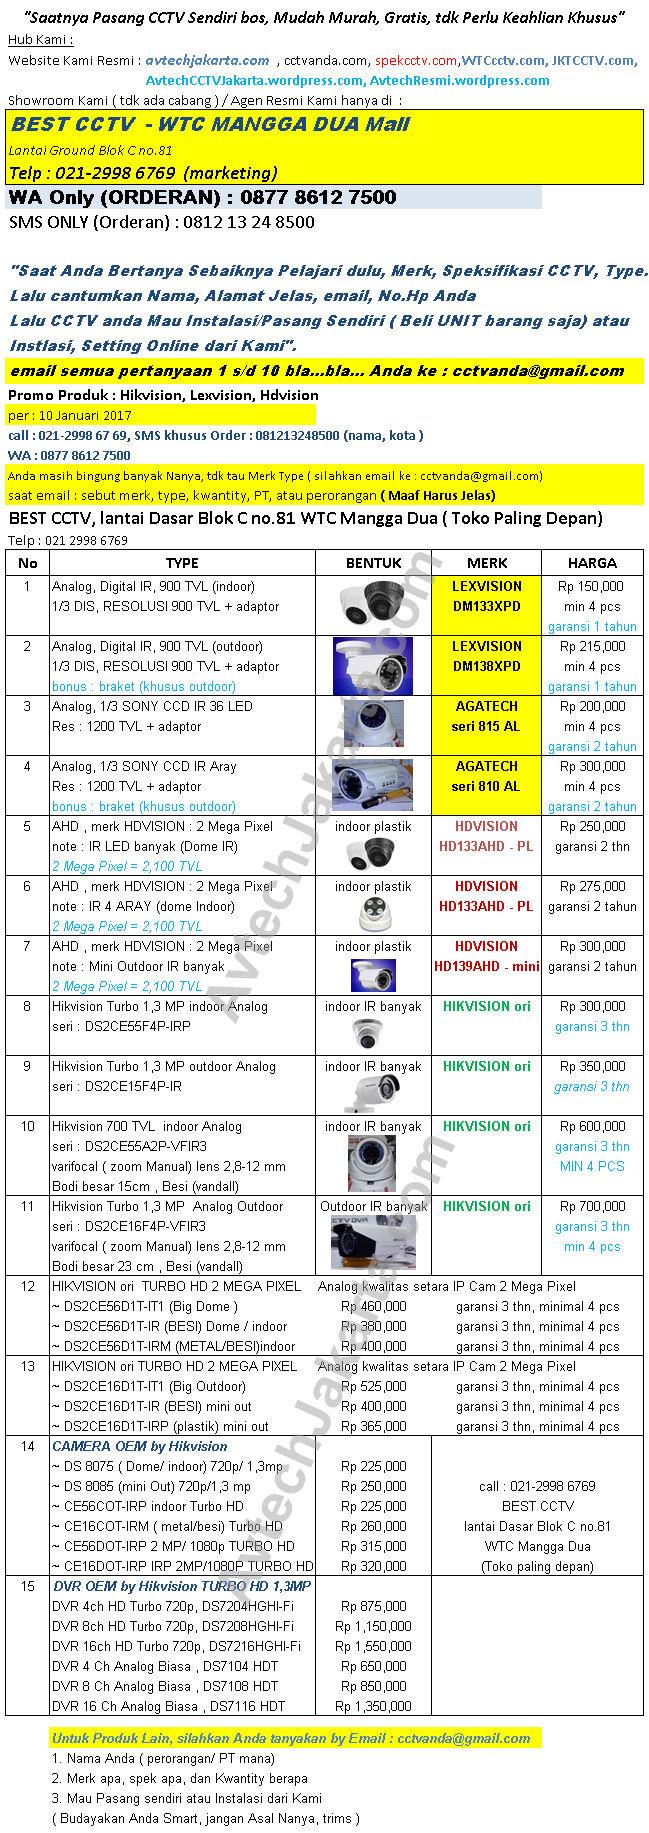 Promo Produk Hikvision, Lexvision, Hdvision, Agatech Per 10 Januari 2017 - WTC CCTV